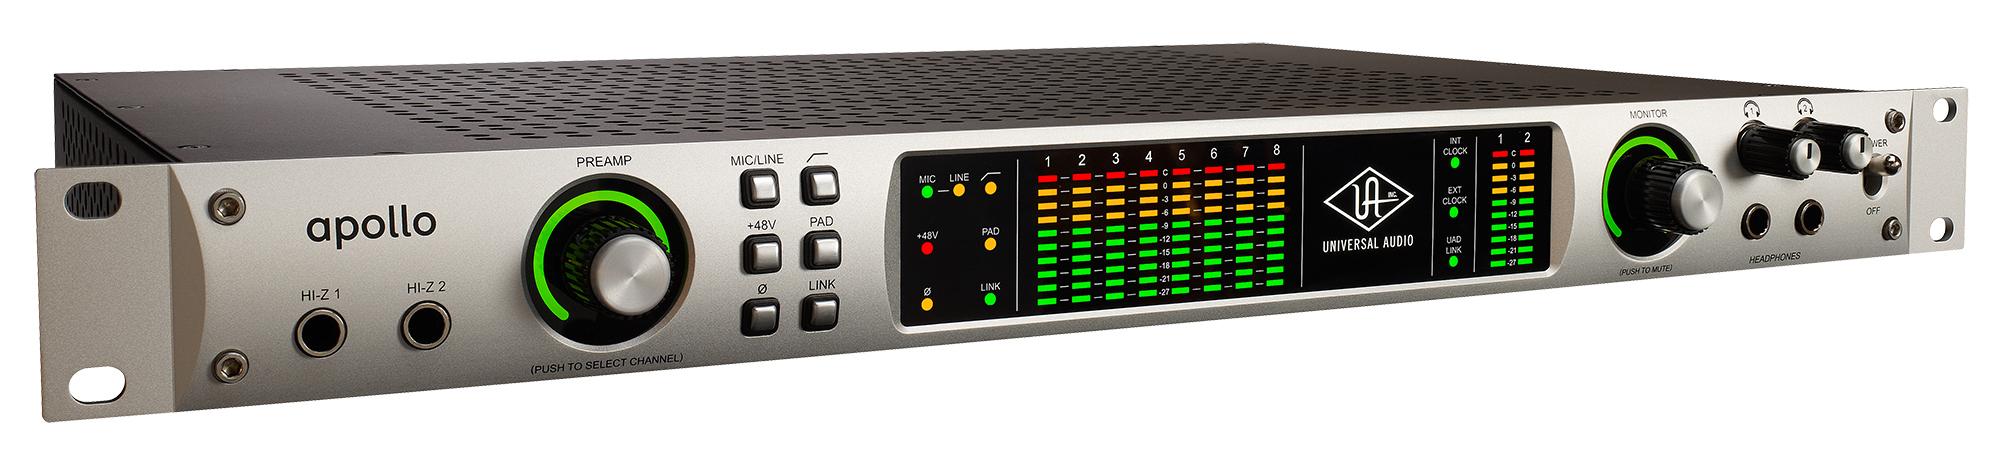 Universal Audio APOLLO-FIREWIRE 18x24 FireWire Audio Interface With